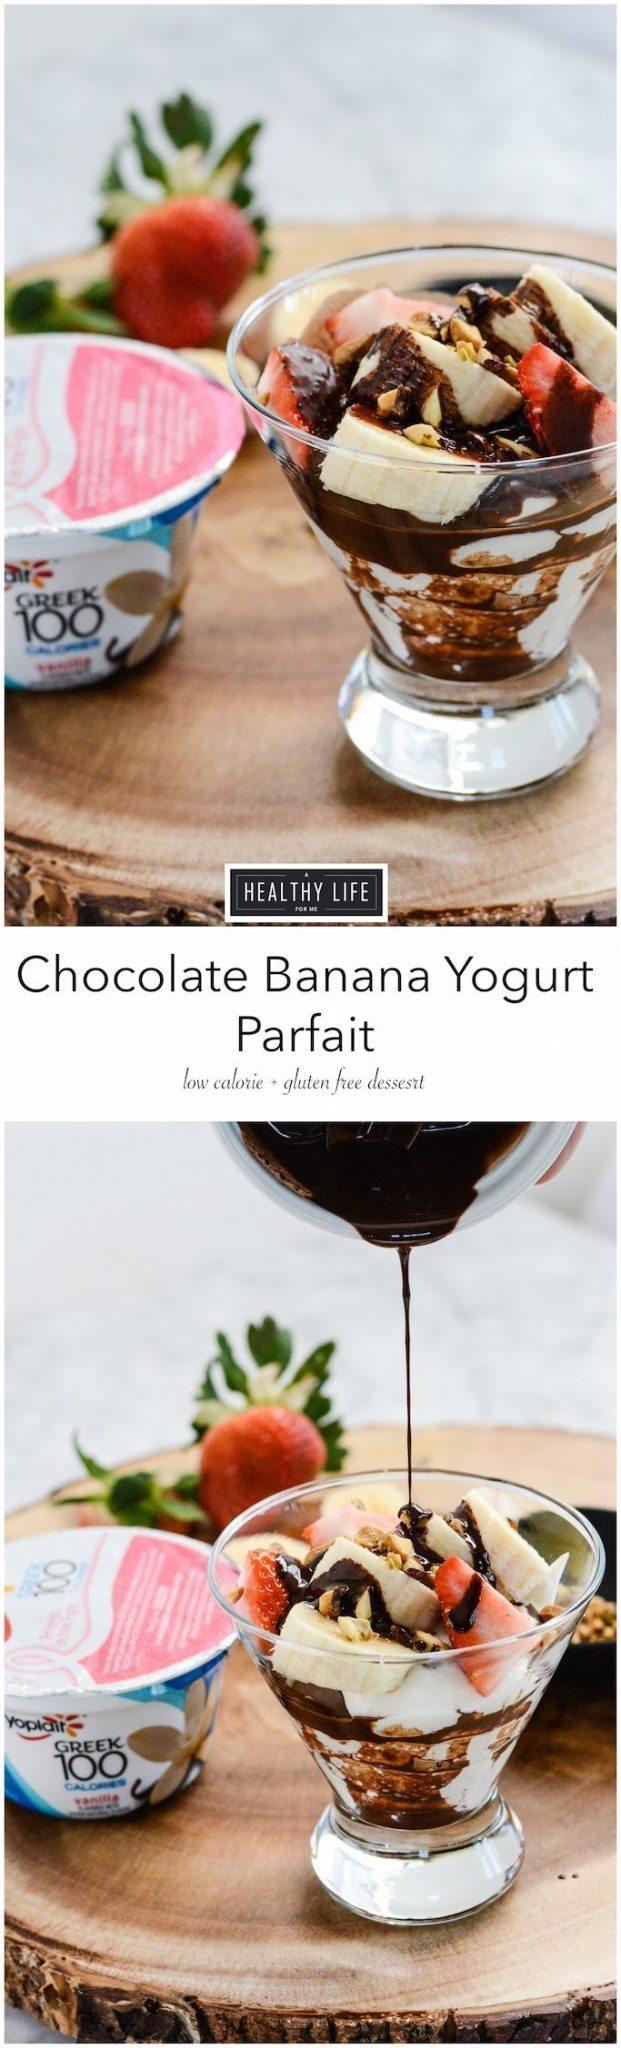 Chocolate Banana Yogurt Parfait_